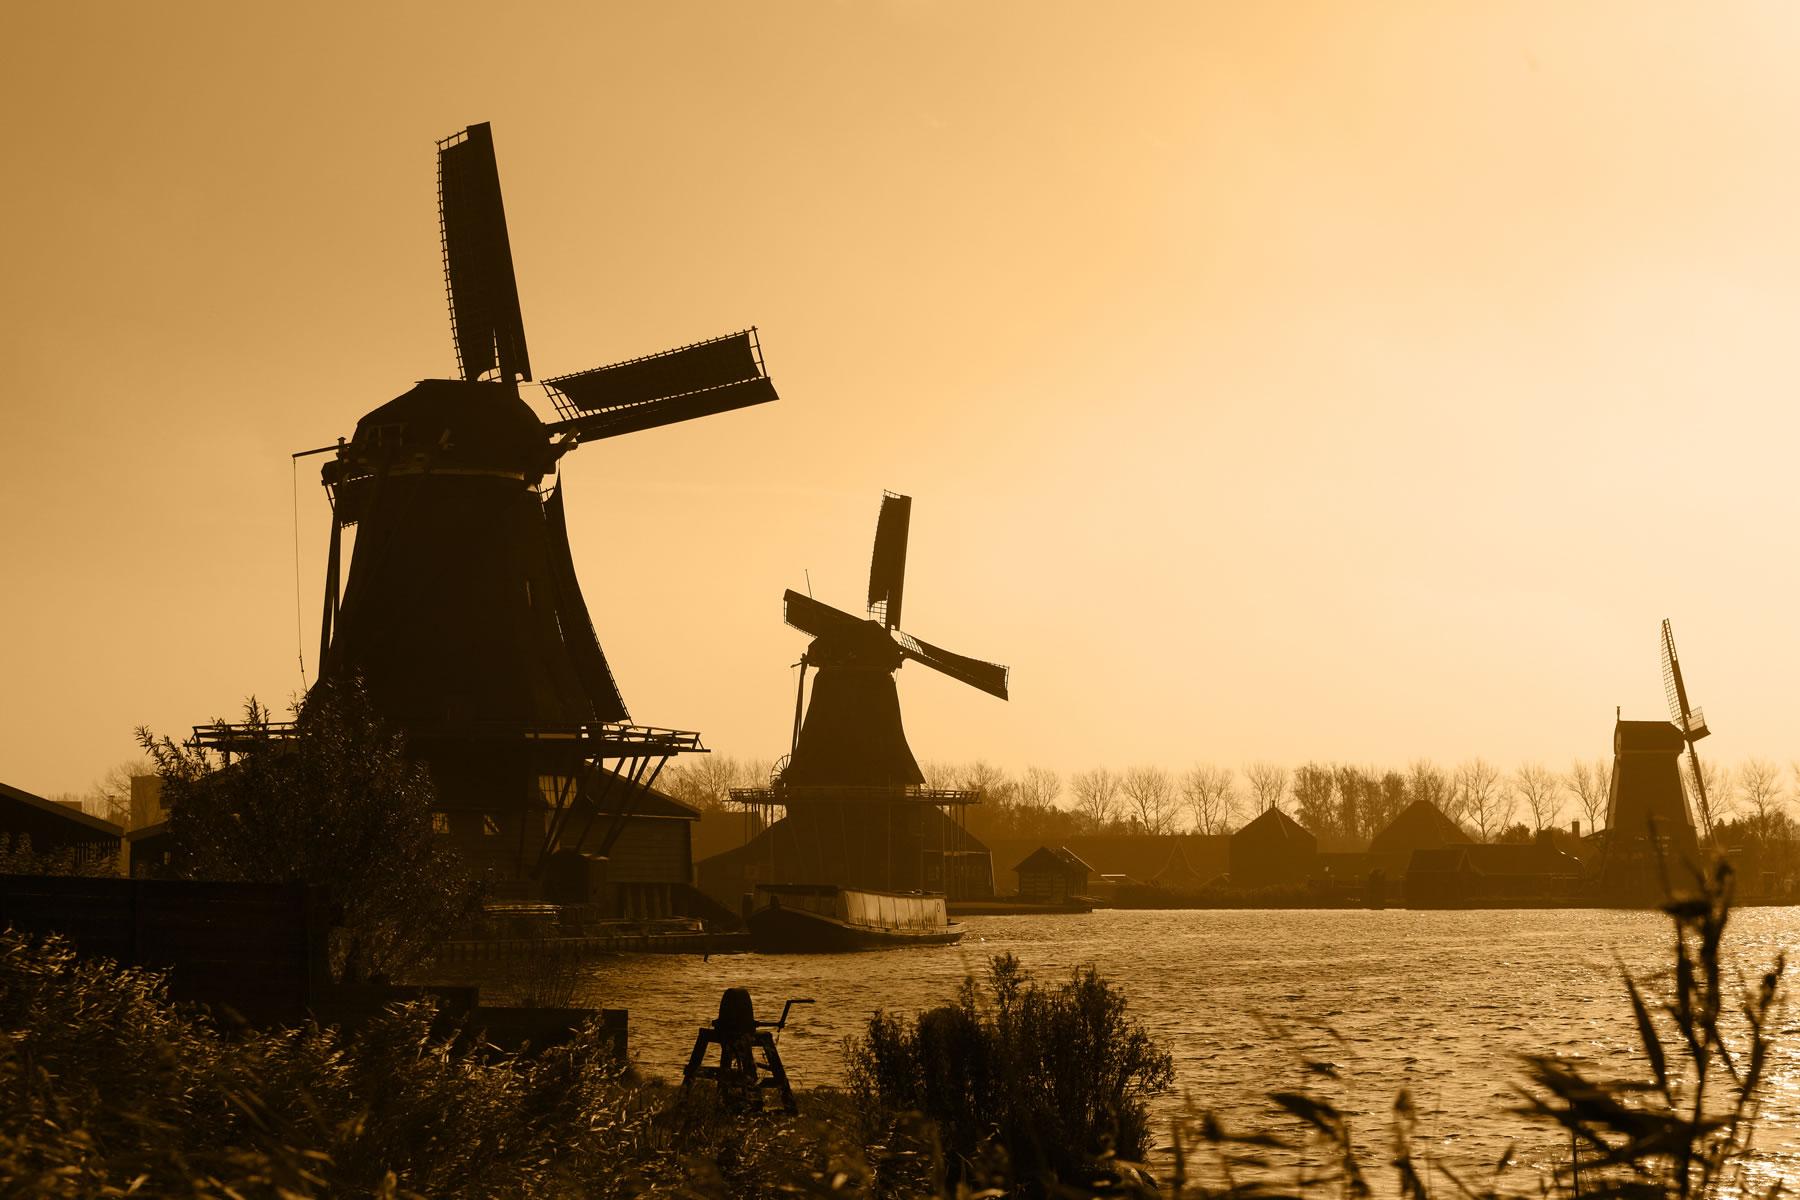 De Hollandse Avond is het leukste en bekendste uitje